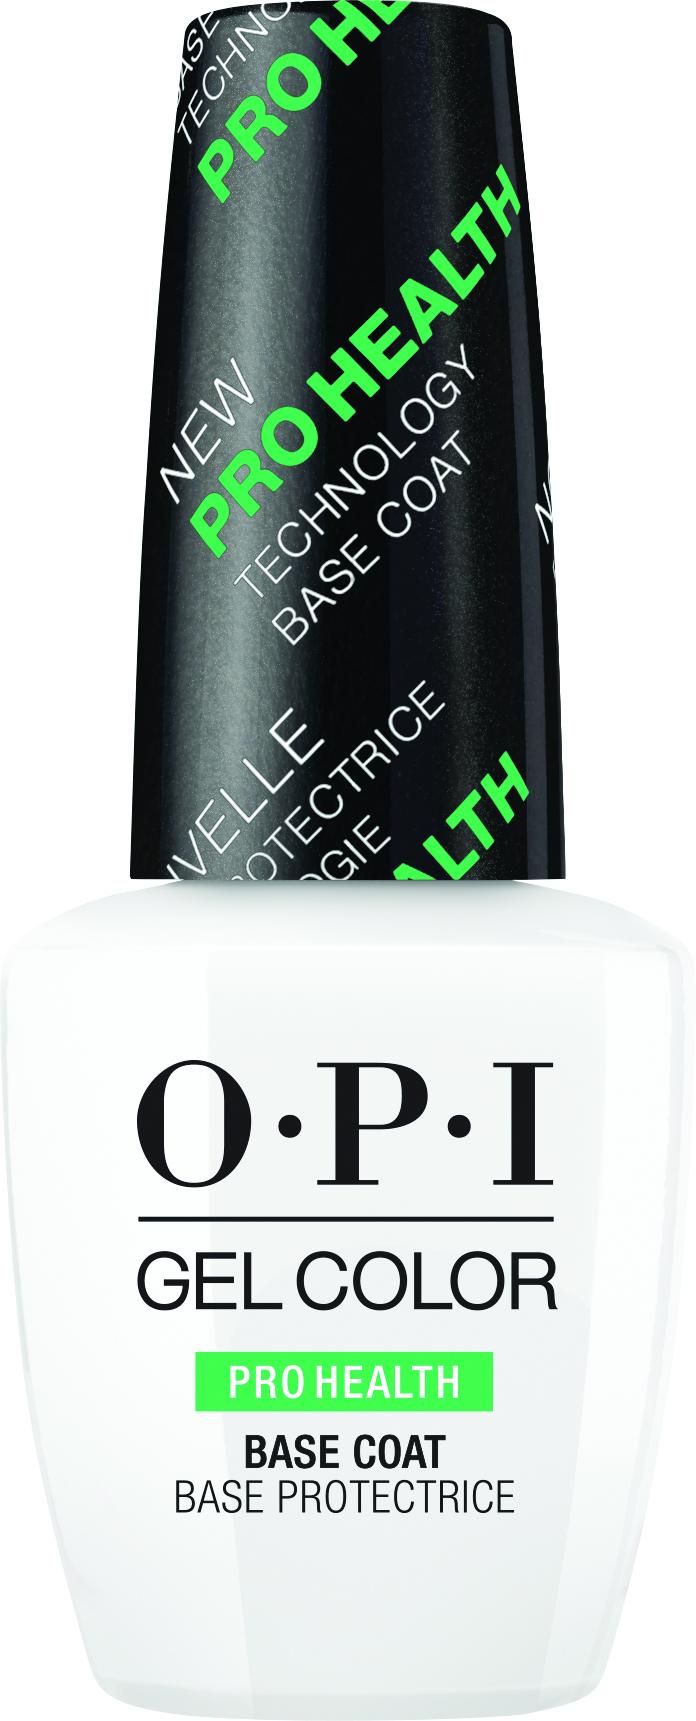 "<p>OPI ProHealth Base Coat </p> <p><a href=""http://www.opi.com"">www.opi.com</a></p>"